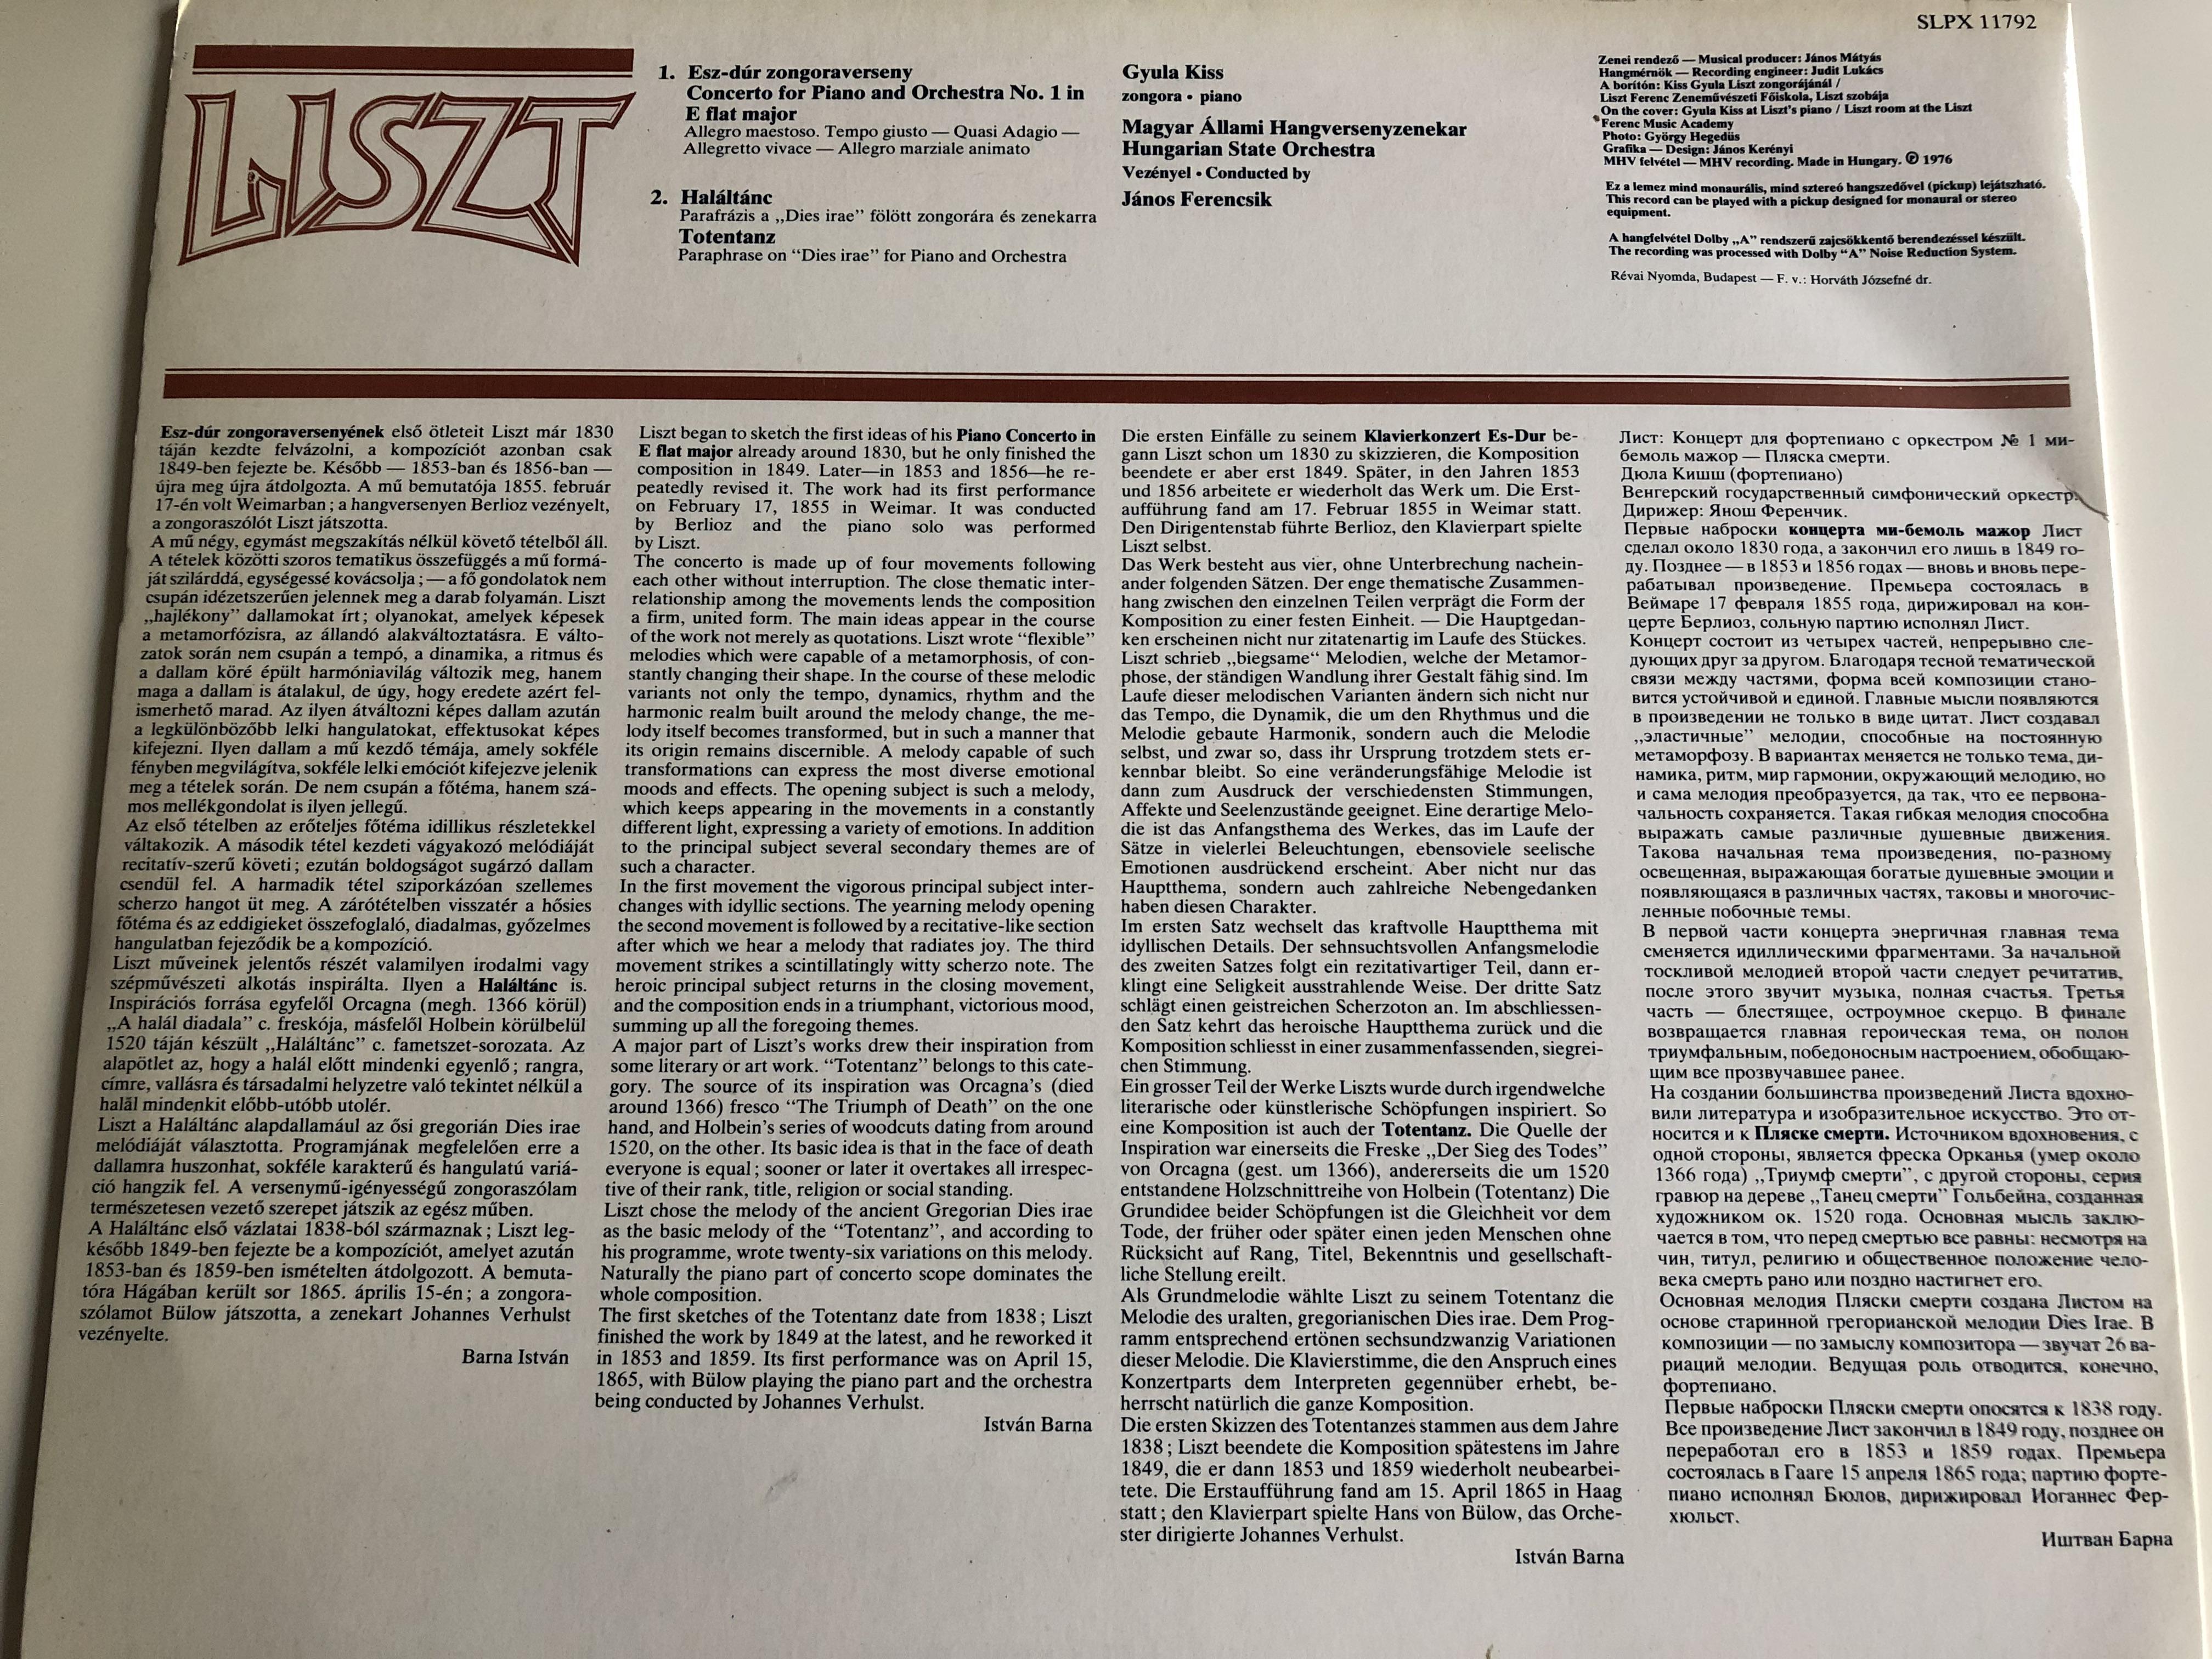 liszt-piano-concerto-in-e-flat-major-totentanz-gyula-kiss-conducted-j-nos-ferencsik-hungarian-state-orchestra-hungaroton-lp-stereo-mono-slpx-11792-3-.jpg